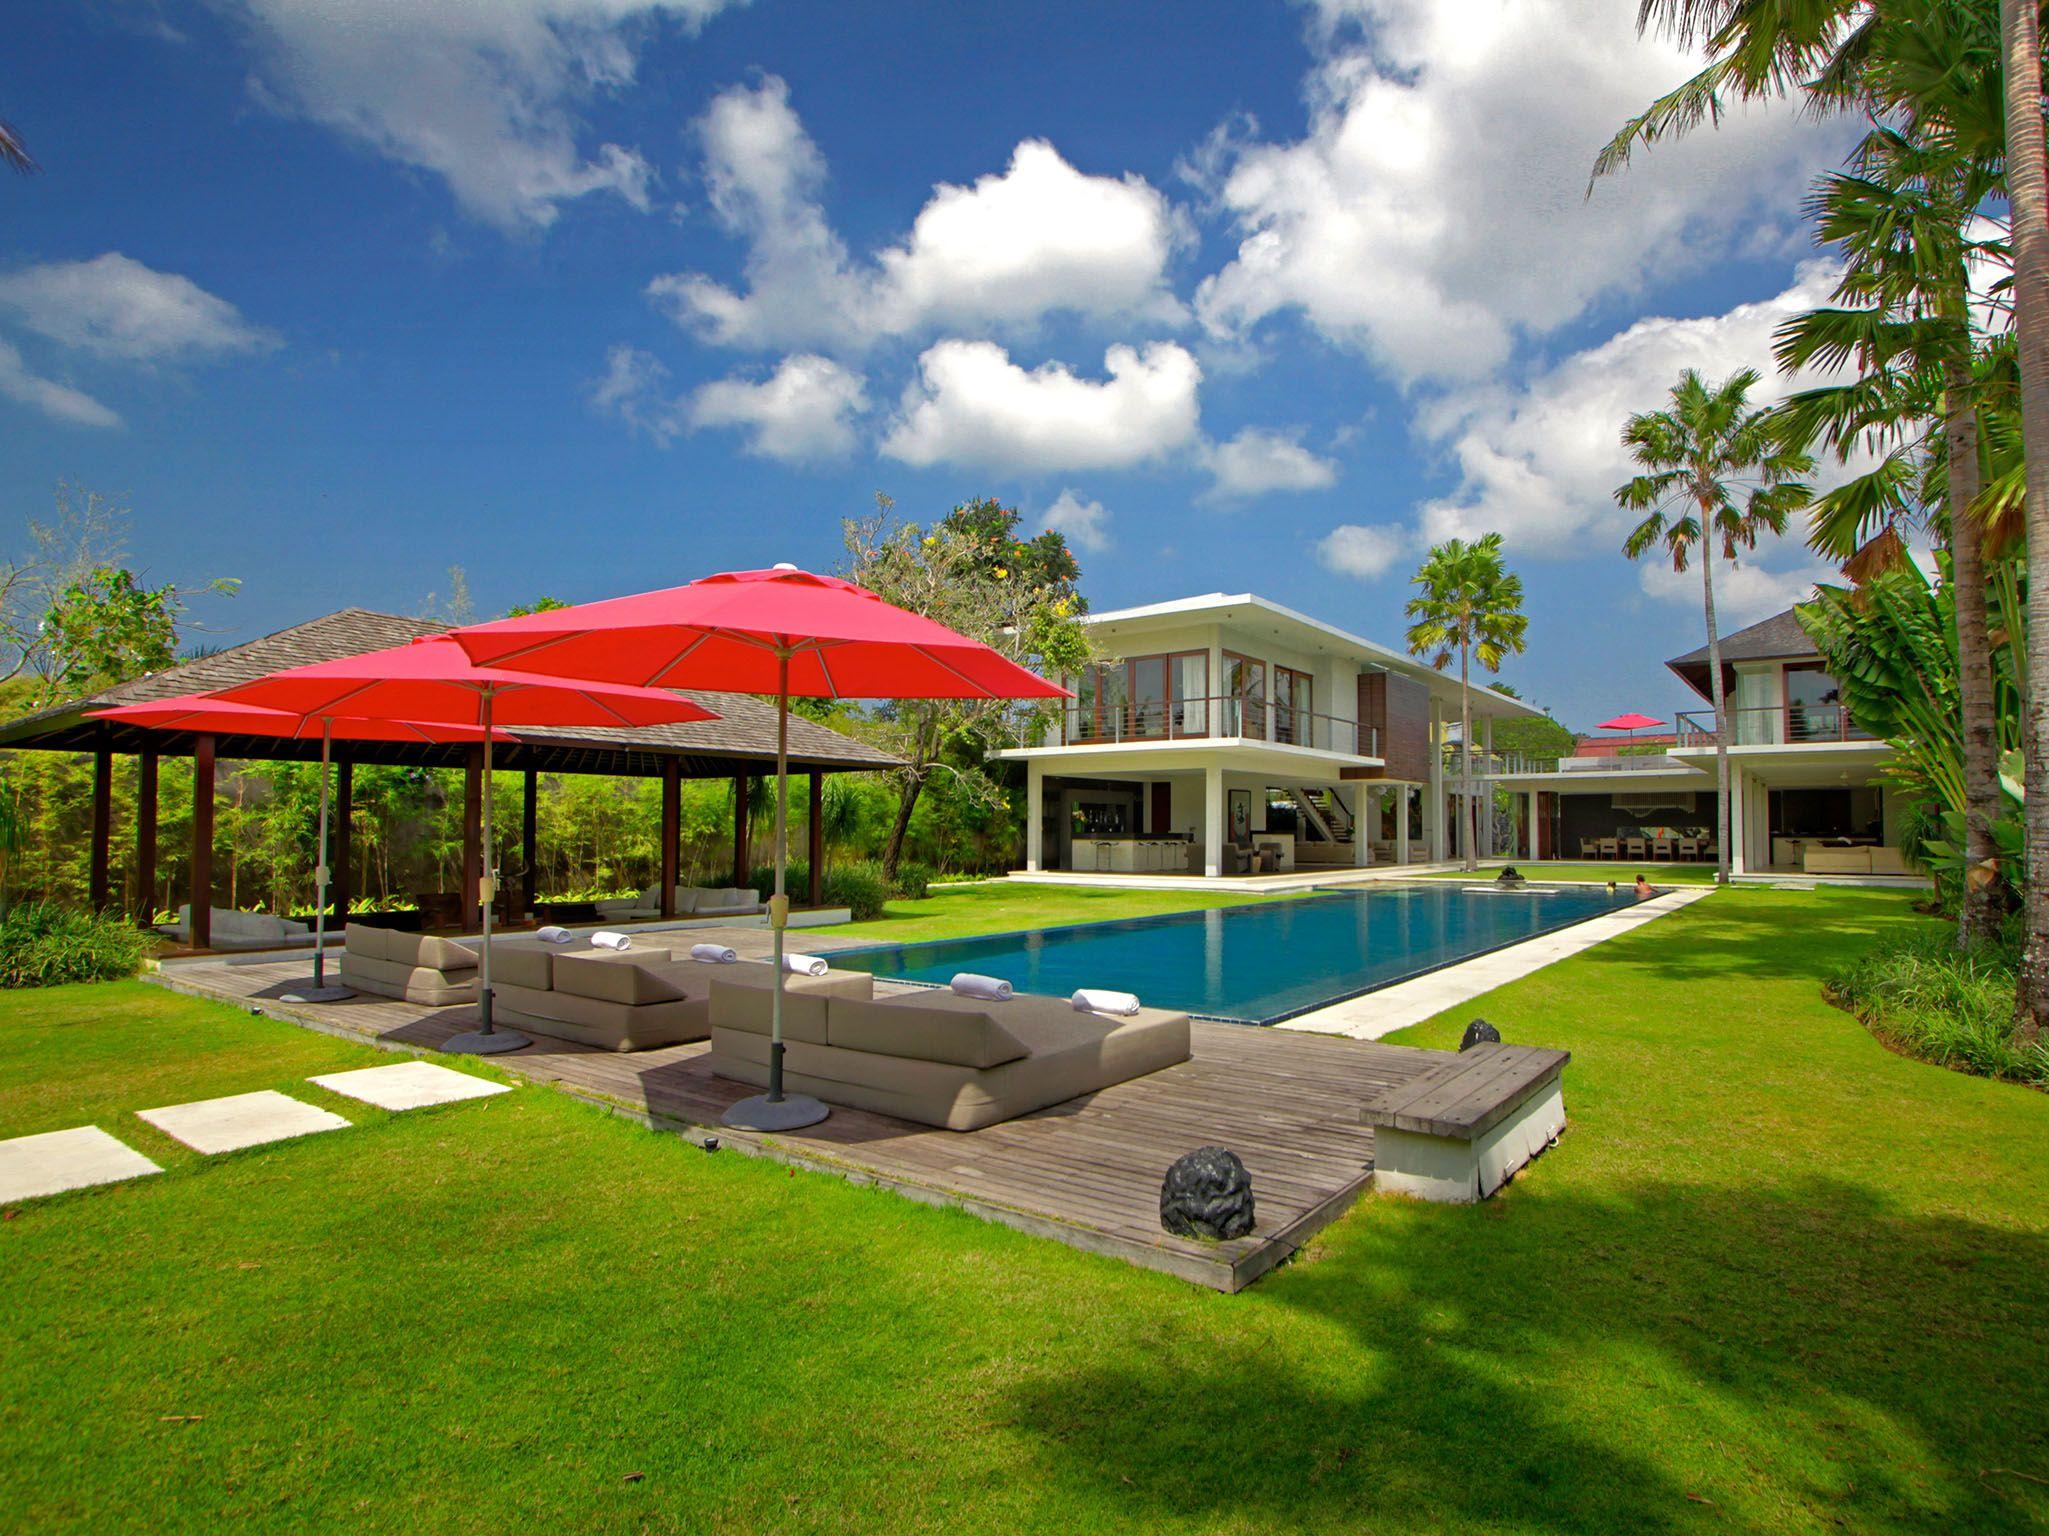 Bali wedding venues on the beach  Villa Kalyani  AffittaBali  Villas and apartments for rental